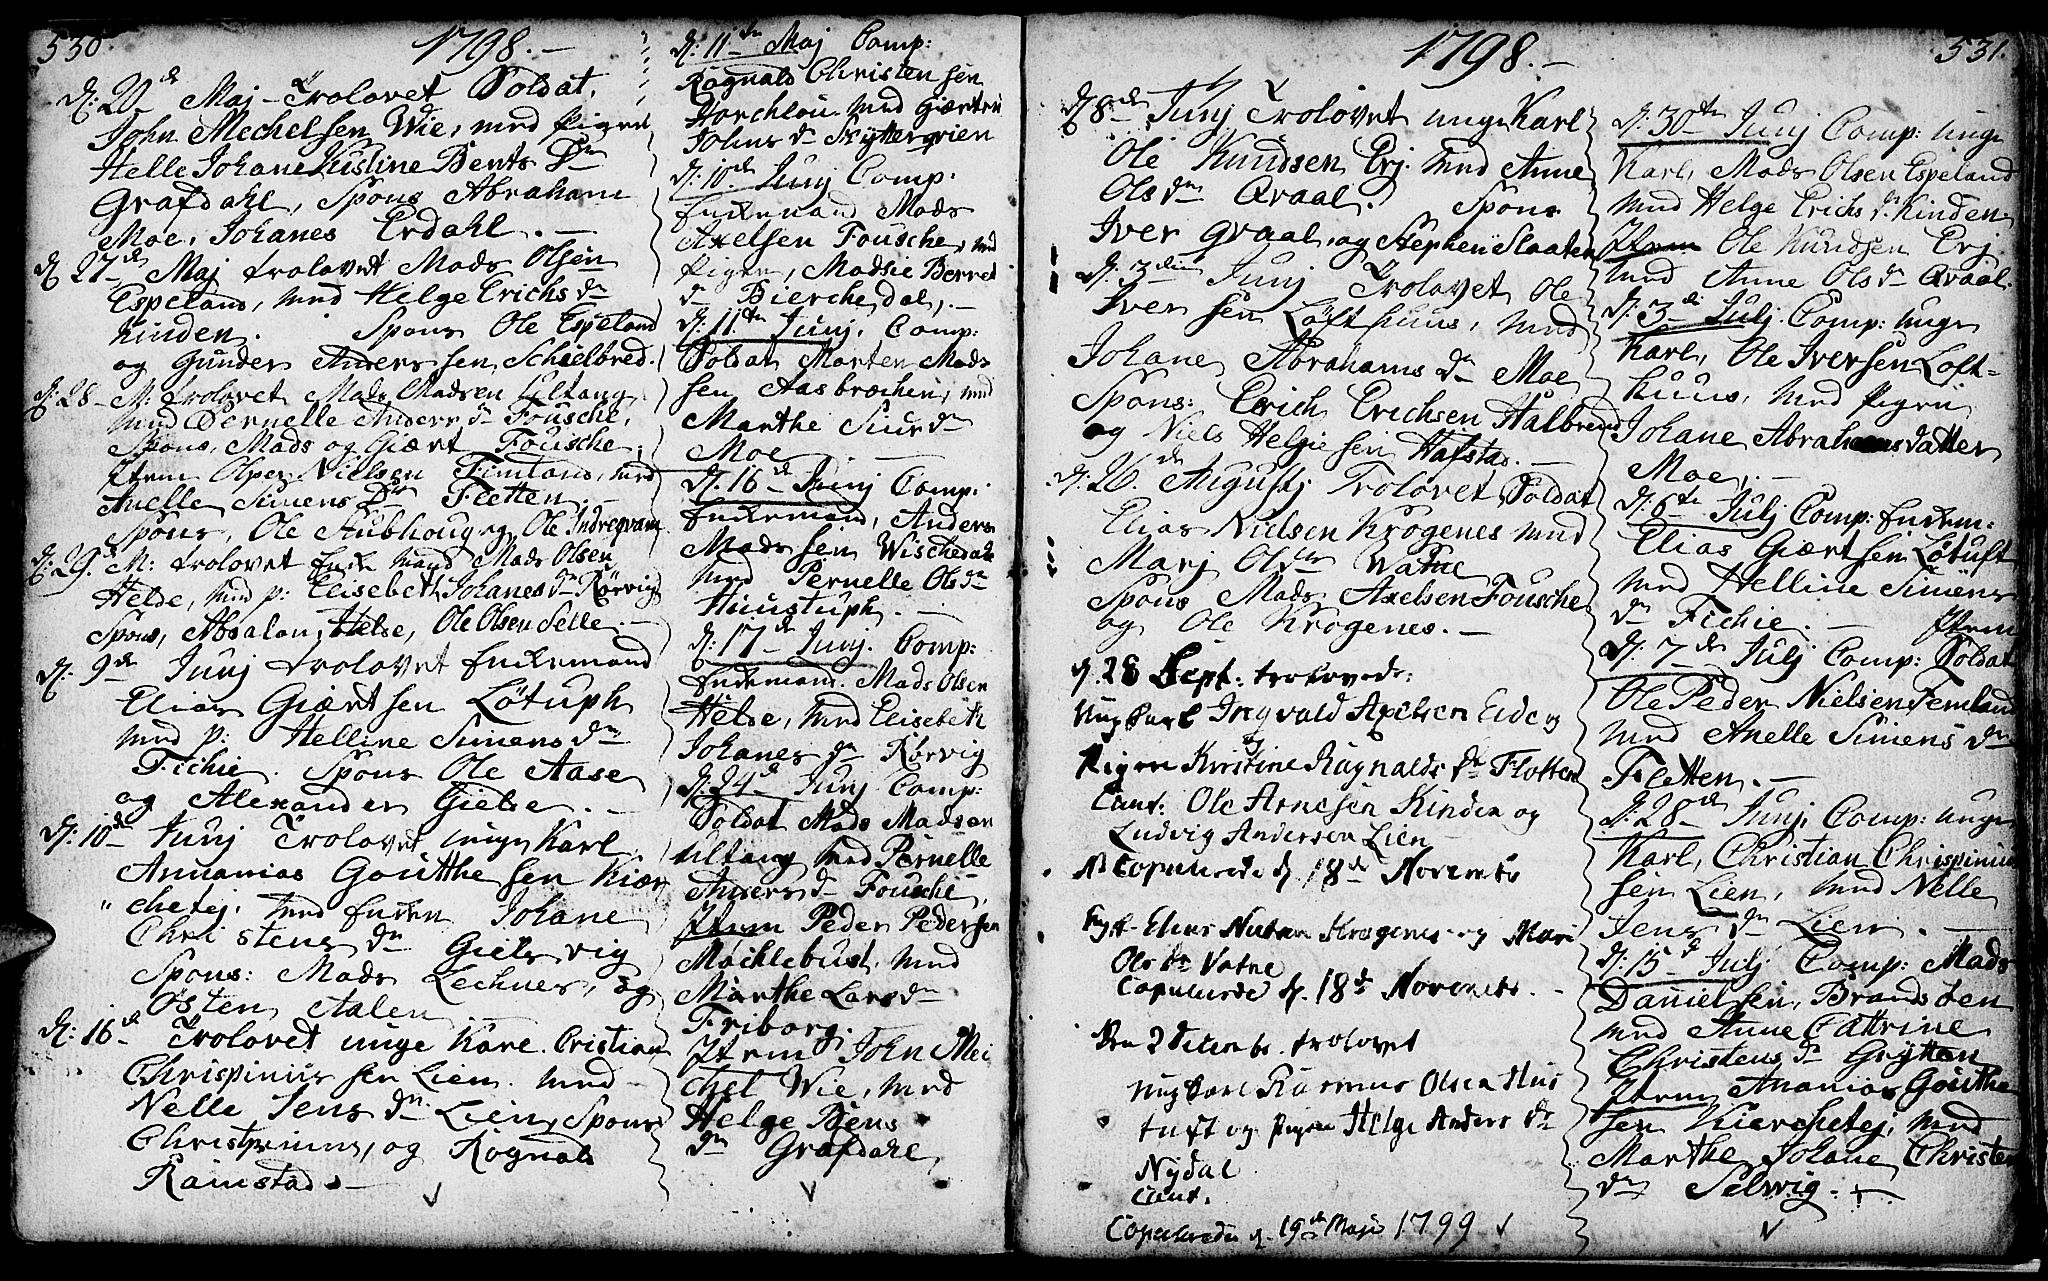 SAB, Førde sokneprestembete, H/Haa: Ministerialbok nr. A 4, 1781-1803, s. 530-531